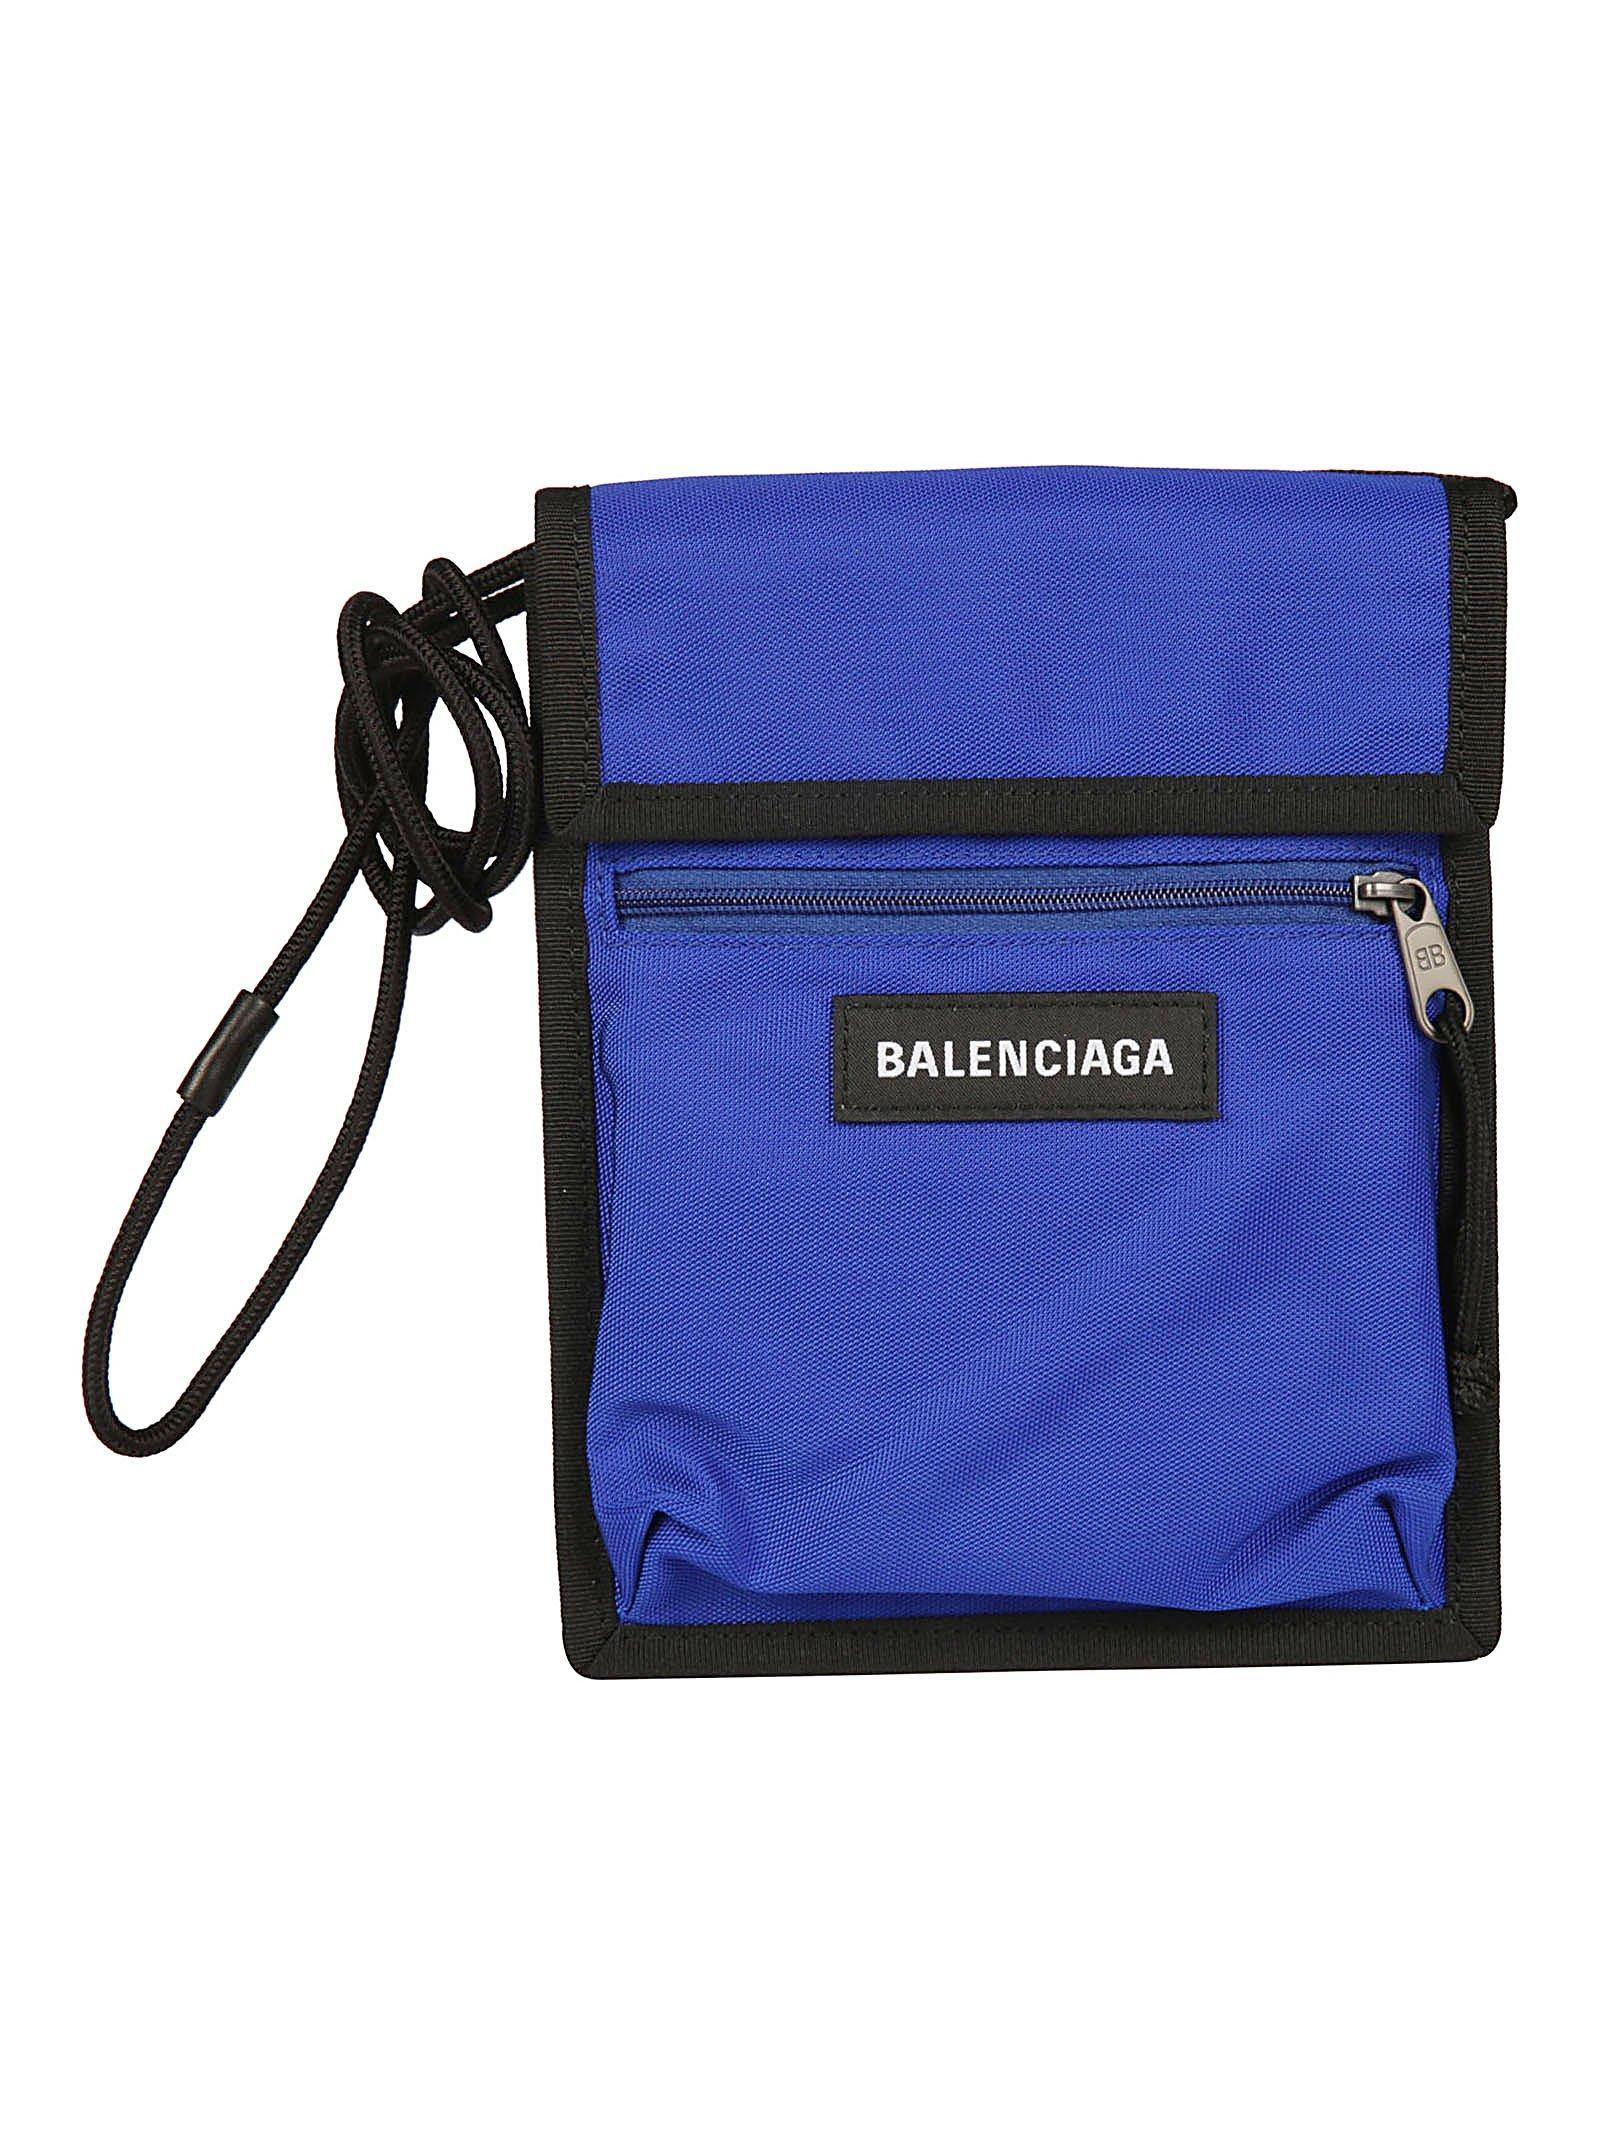 Lyst - Balenciaga Explorer Logo Crossbody Bag in Blue for Men bb86c3eecf913